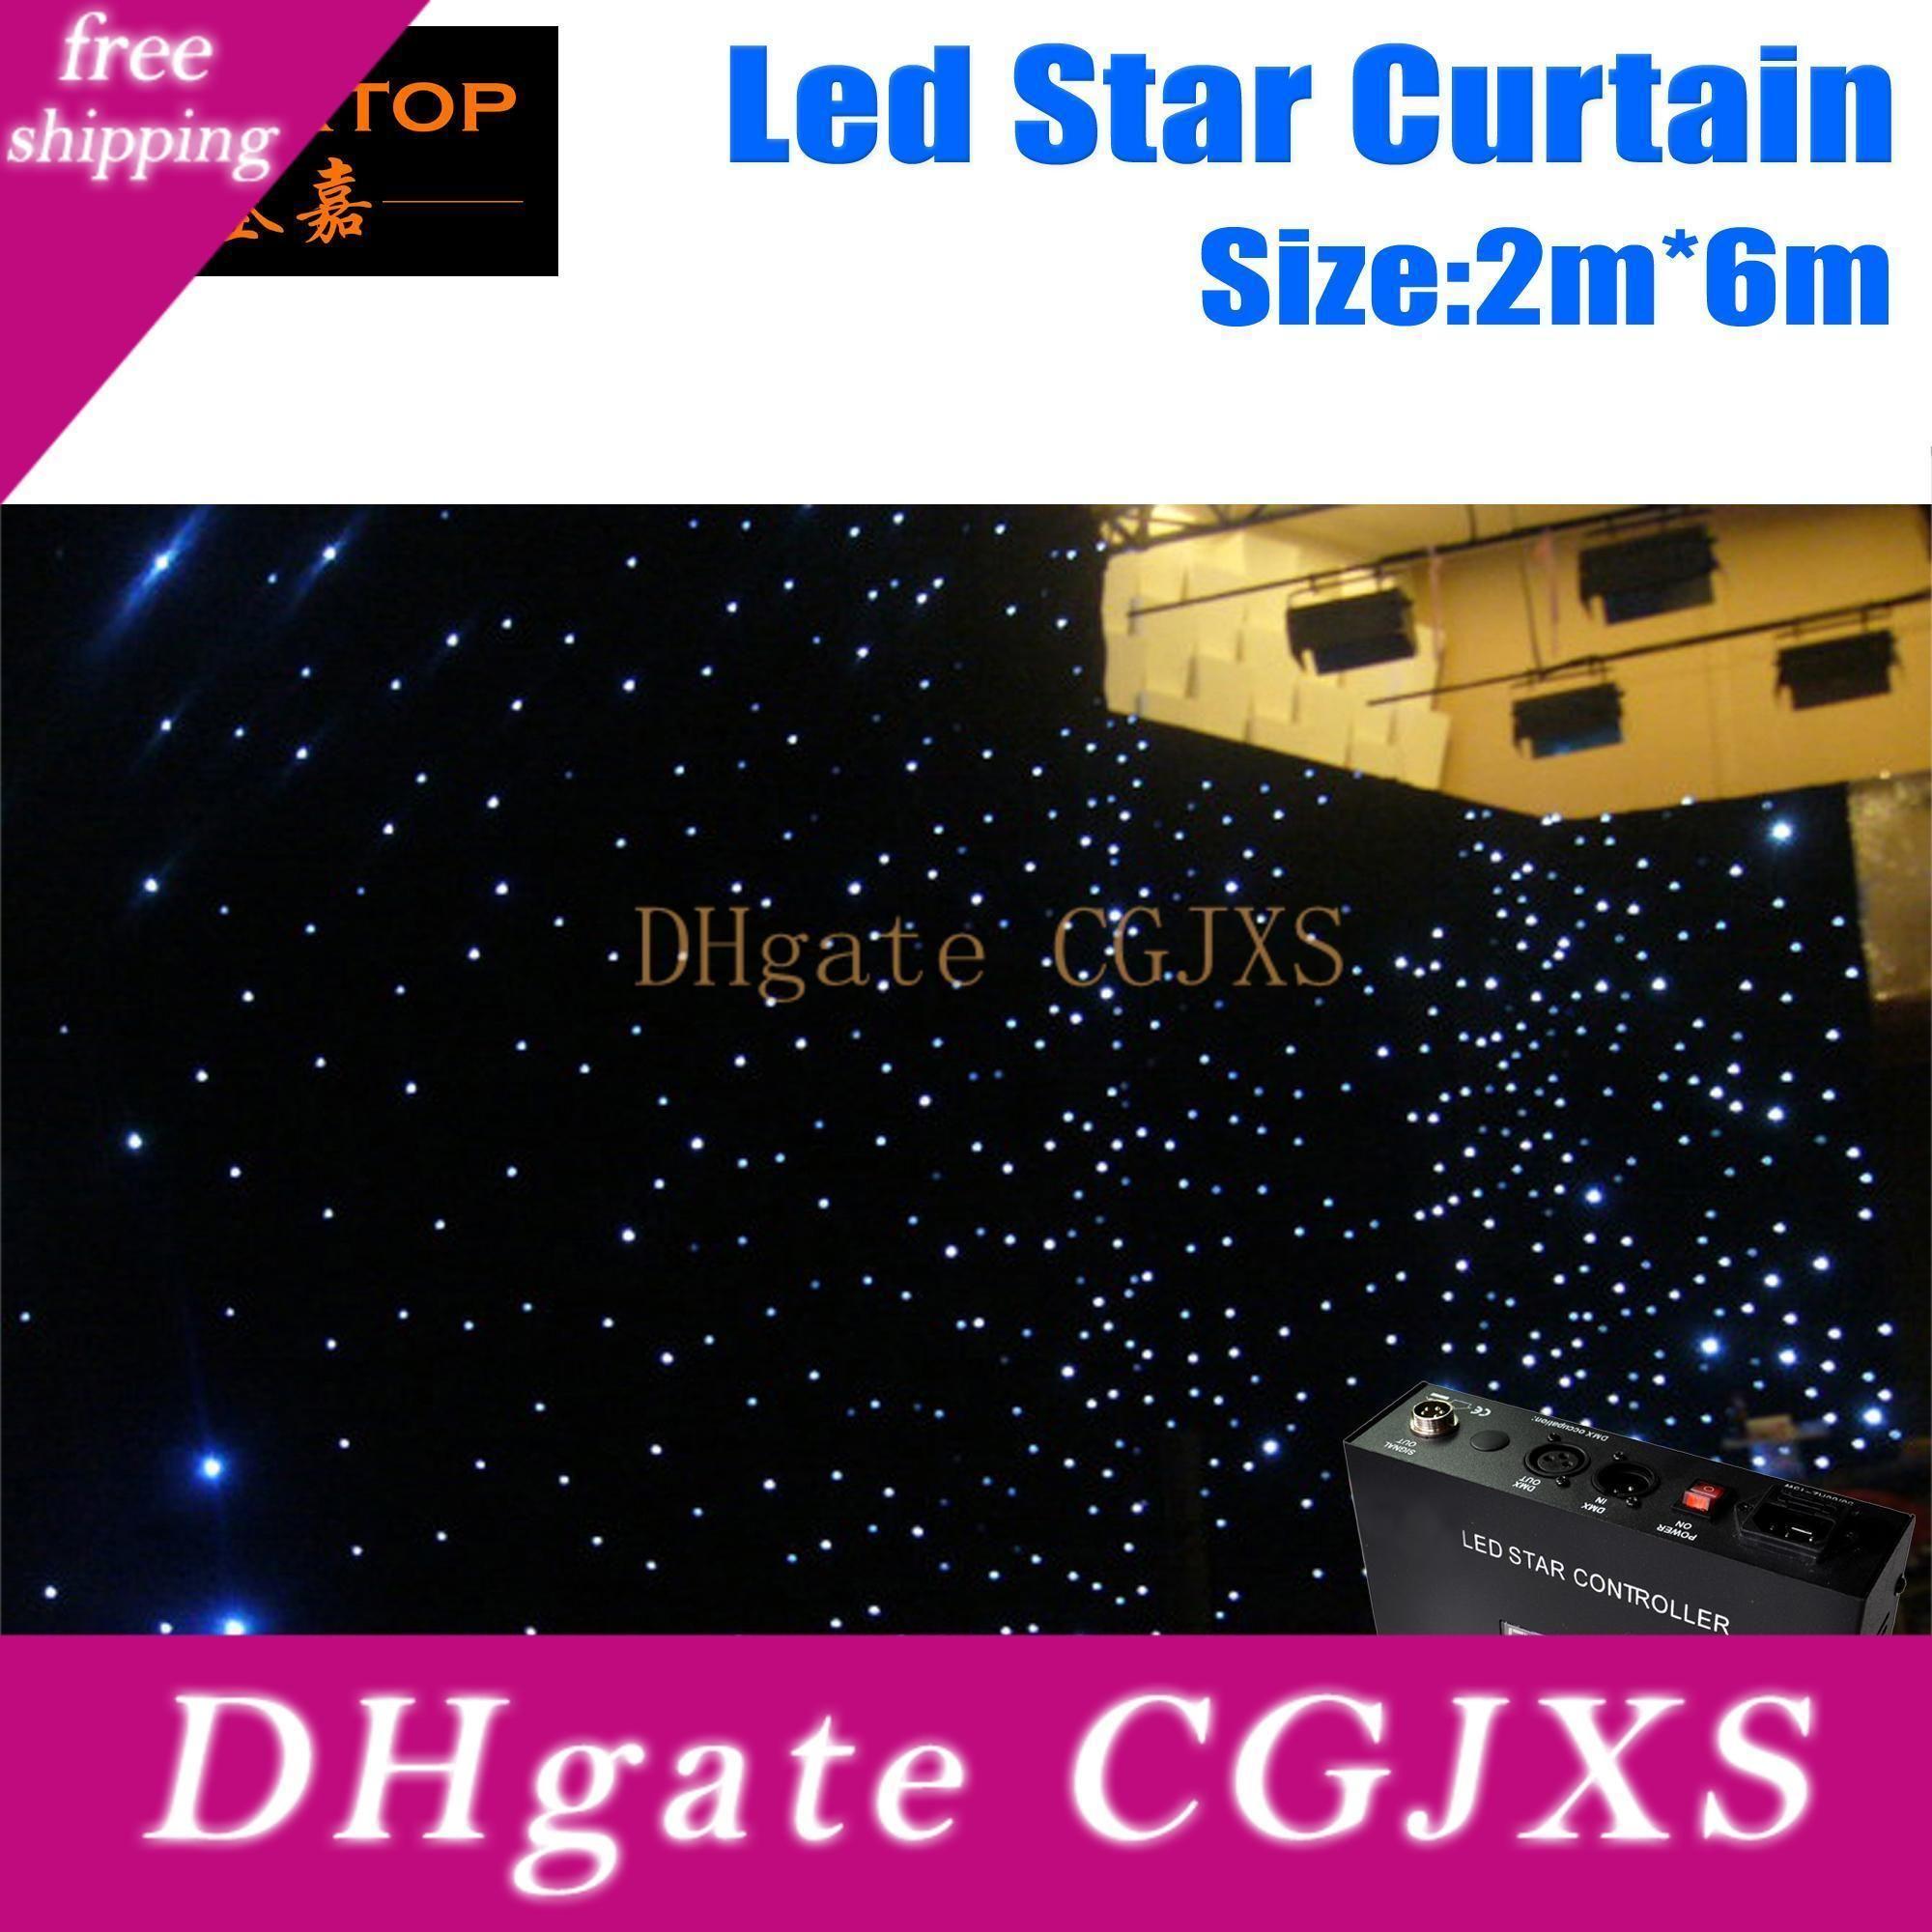 Precio barato 2m * 6m 6m * 2m alta calidad Rgbw / RGB LED de color cortina paño de la estrella con el regulador 90V -240V cortina de luz